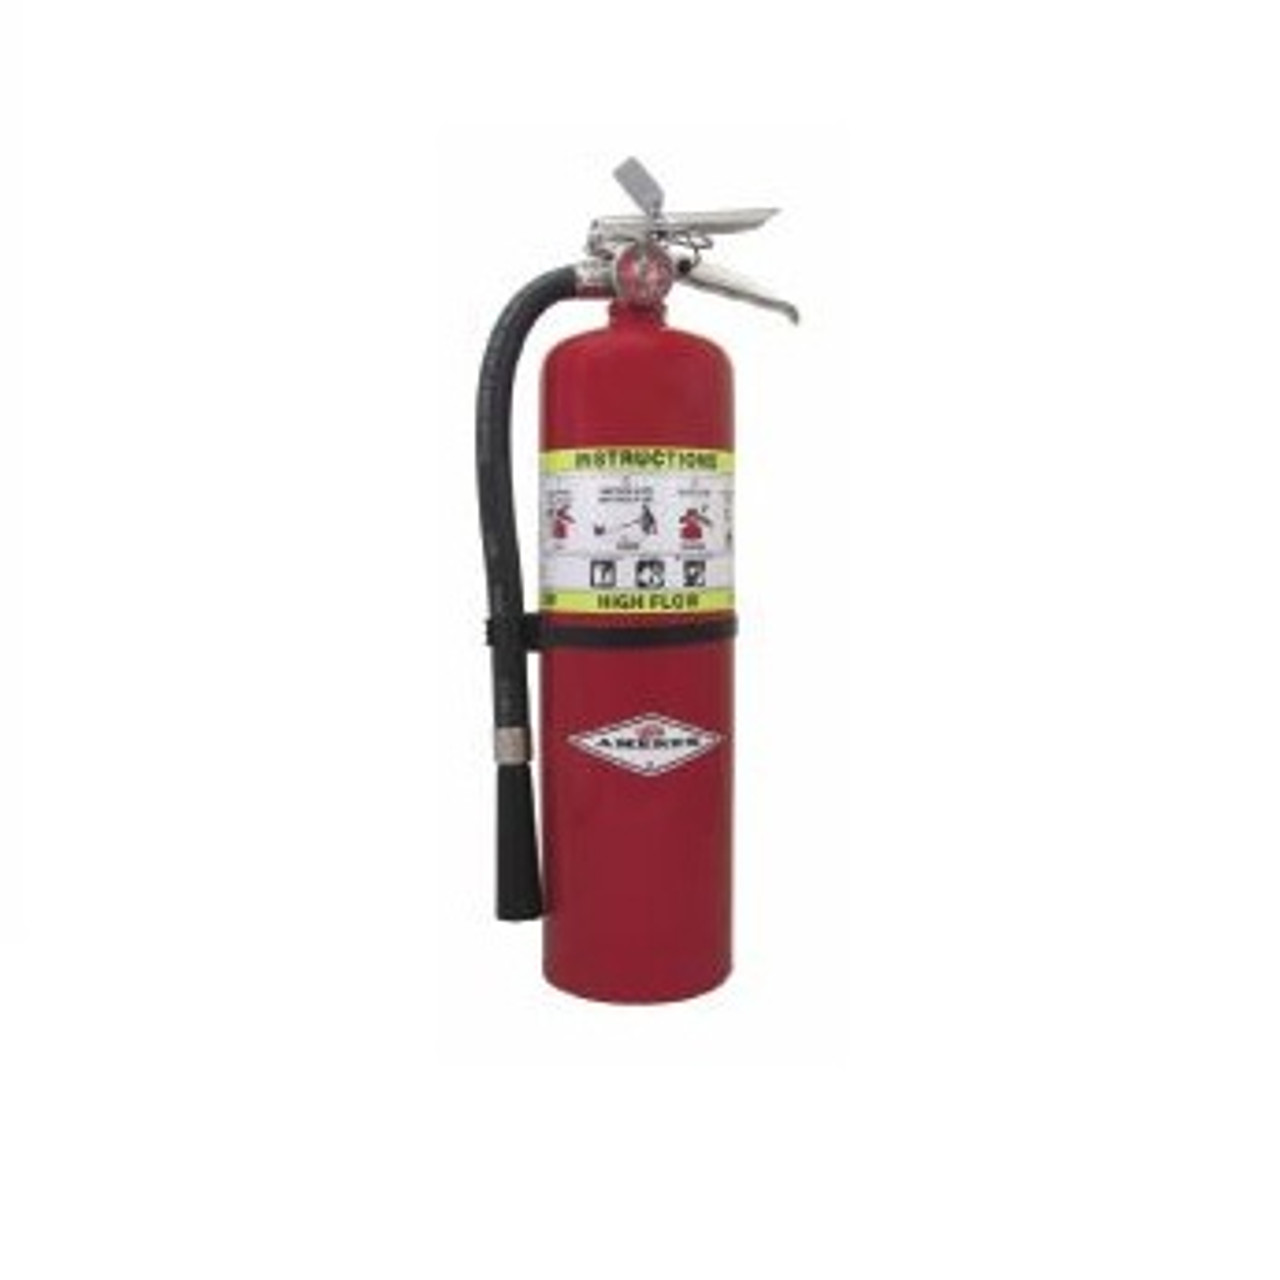 Amerex 722 - 10 lb Purple K High Flow Fire Extinguisher